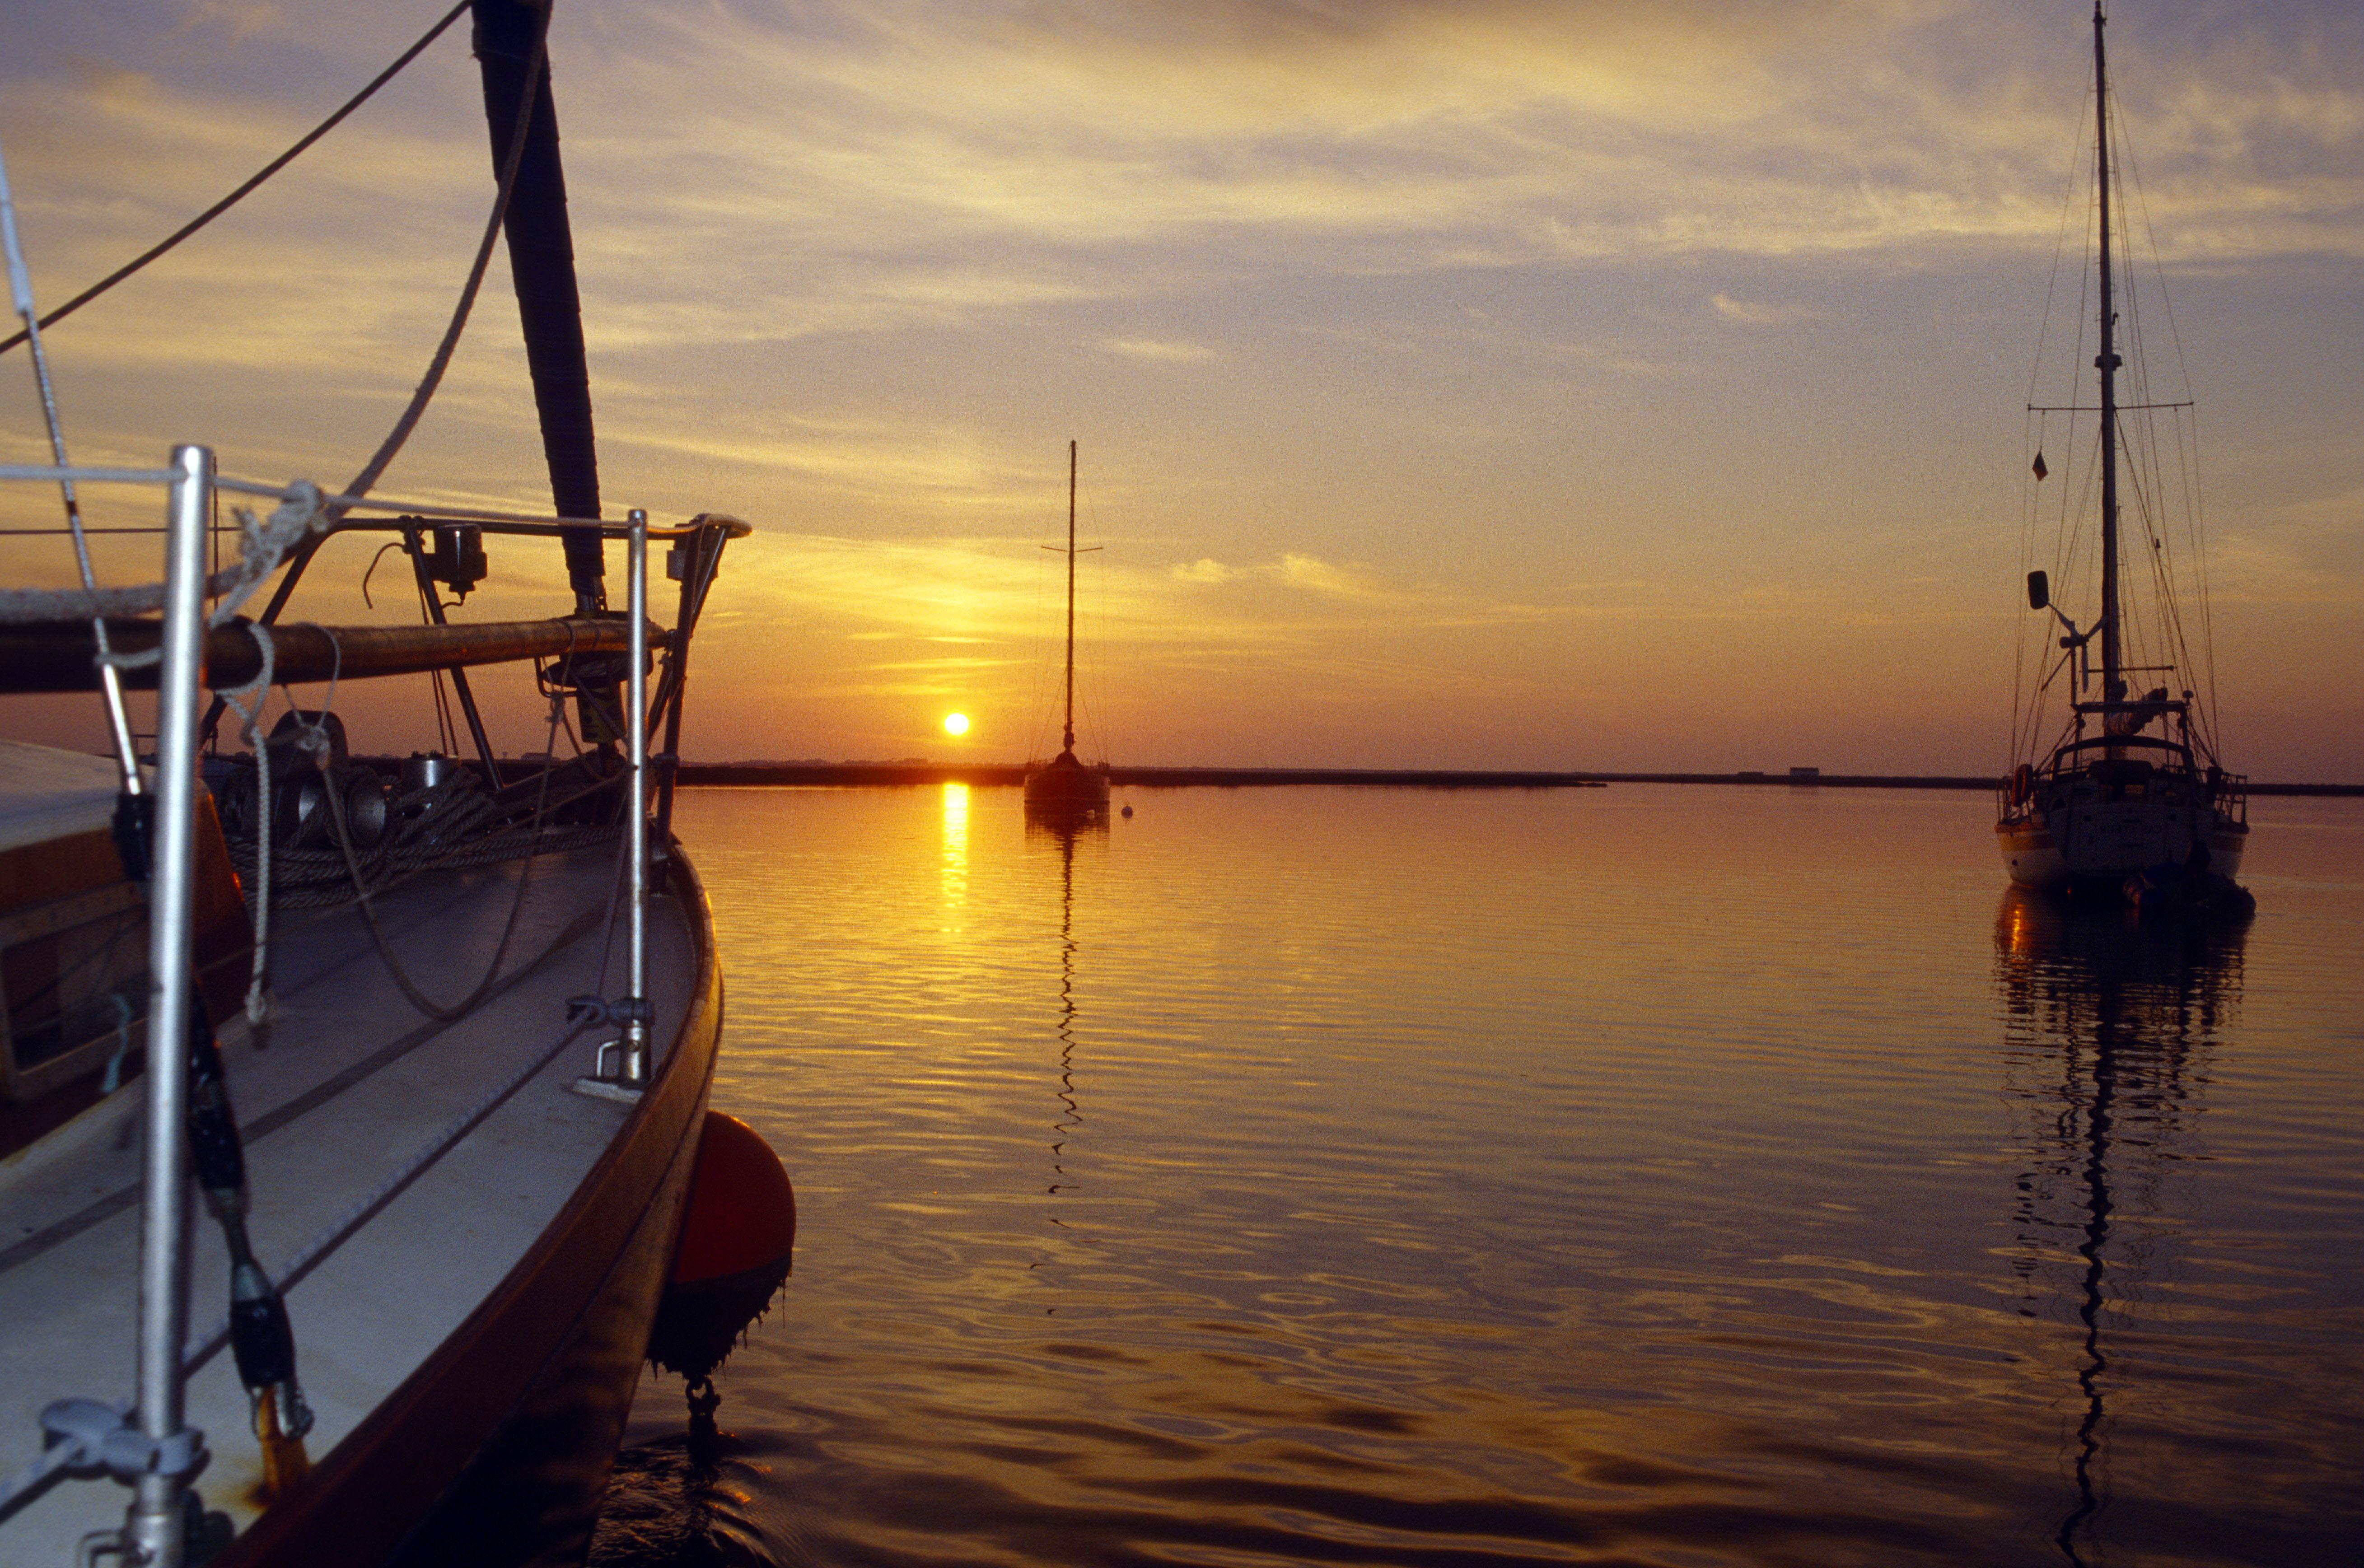 Sunset in Faro